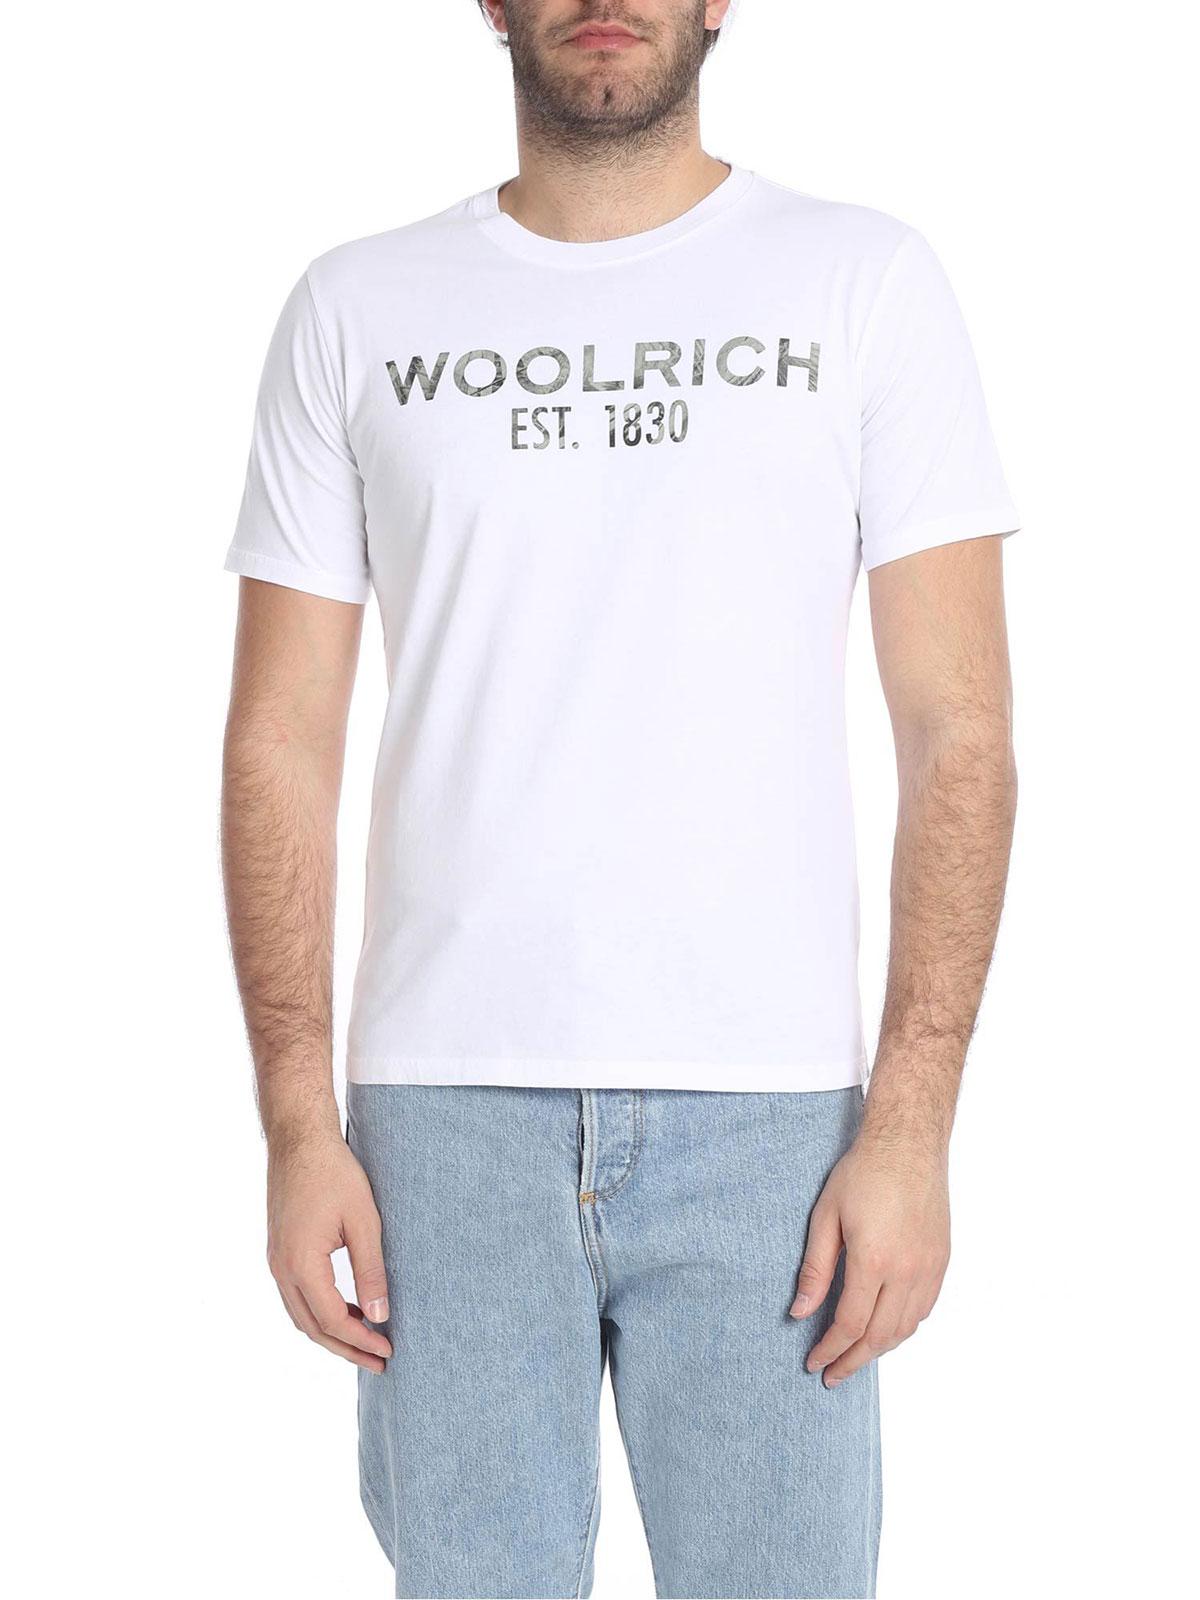 Picture of WOOLRICH | Men's Cotton T-Shirt